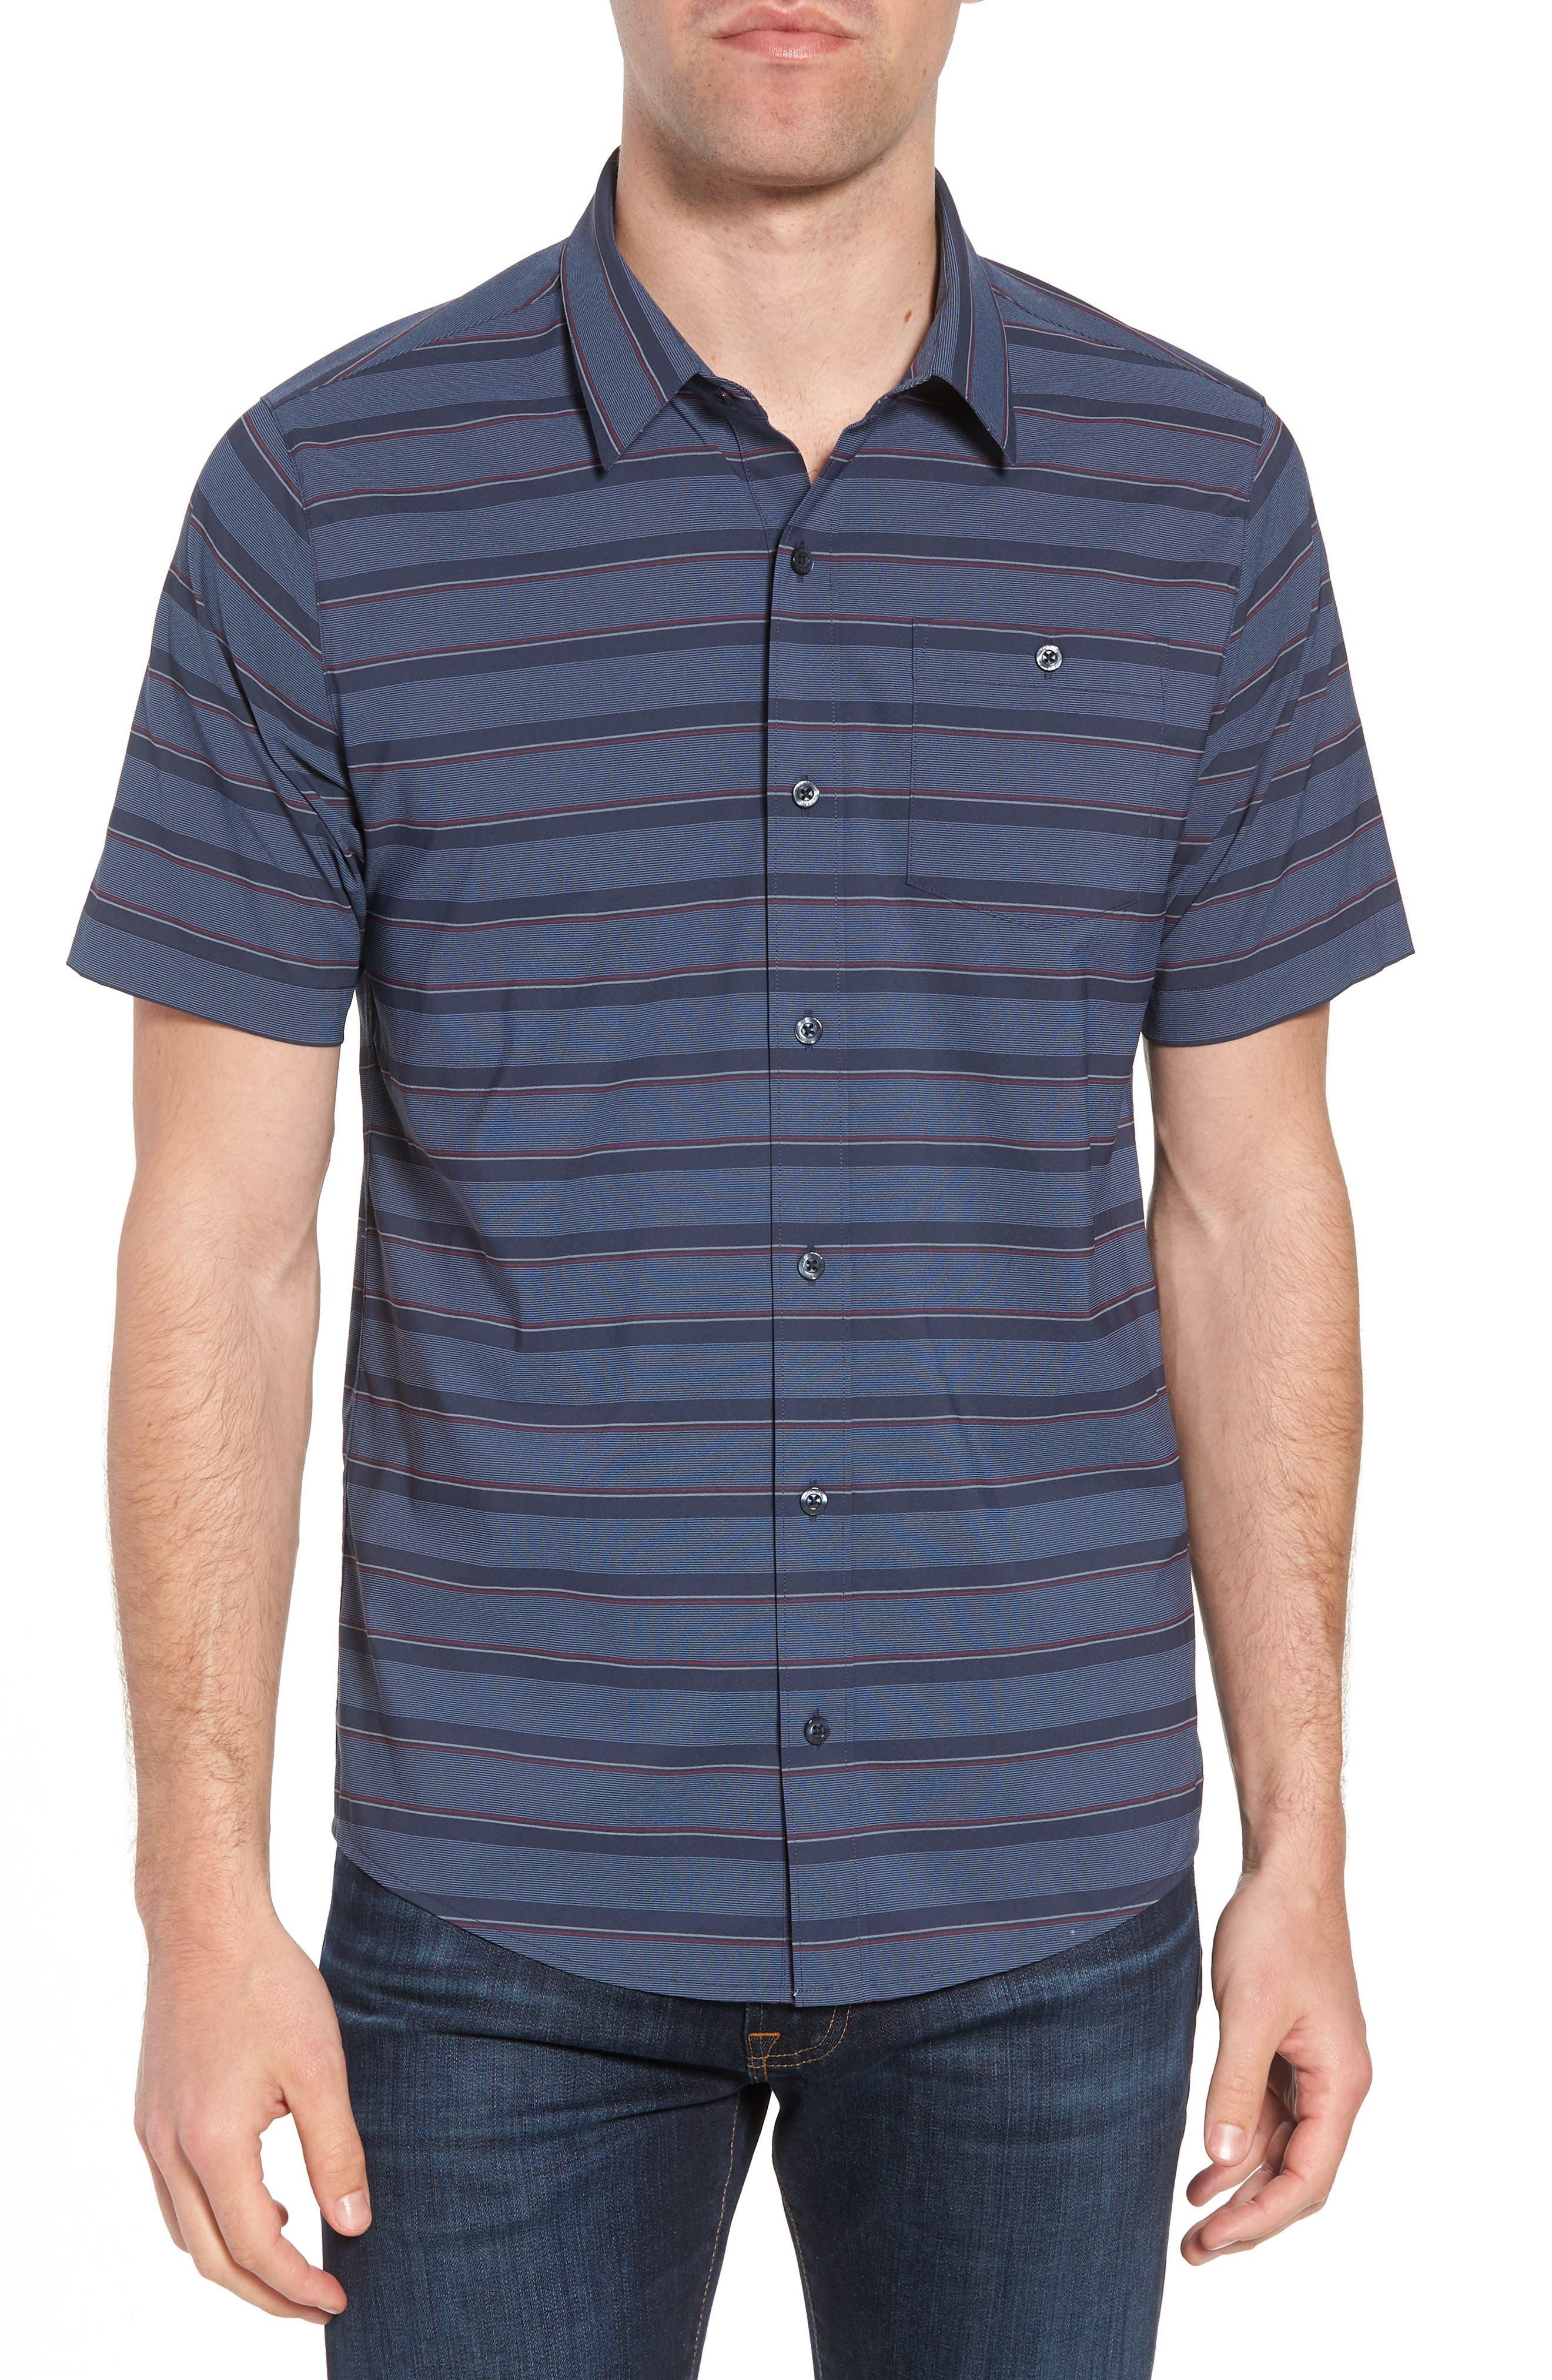 Quiver Regular Fit Sport Shirt,                         Main,                         color, Blue Nights